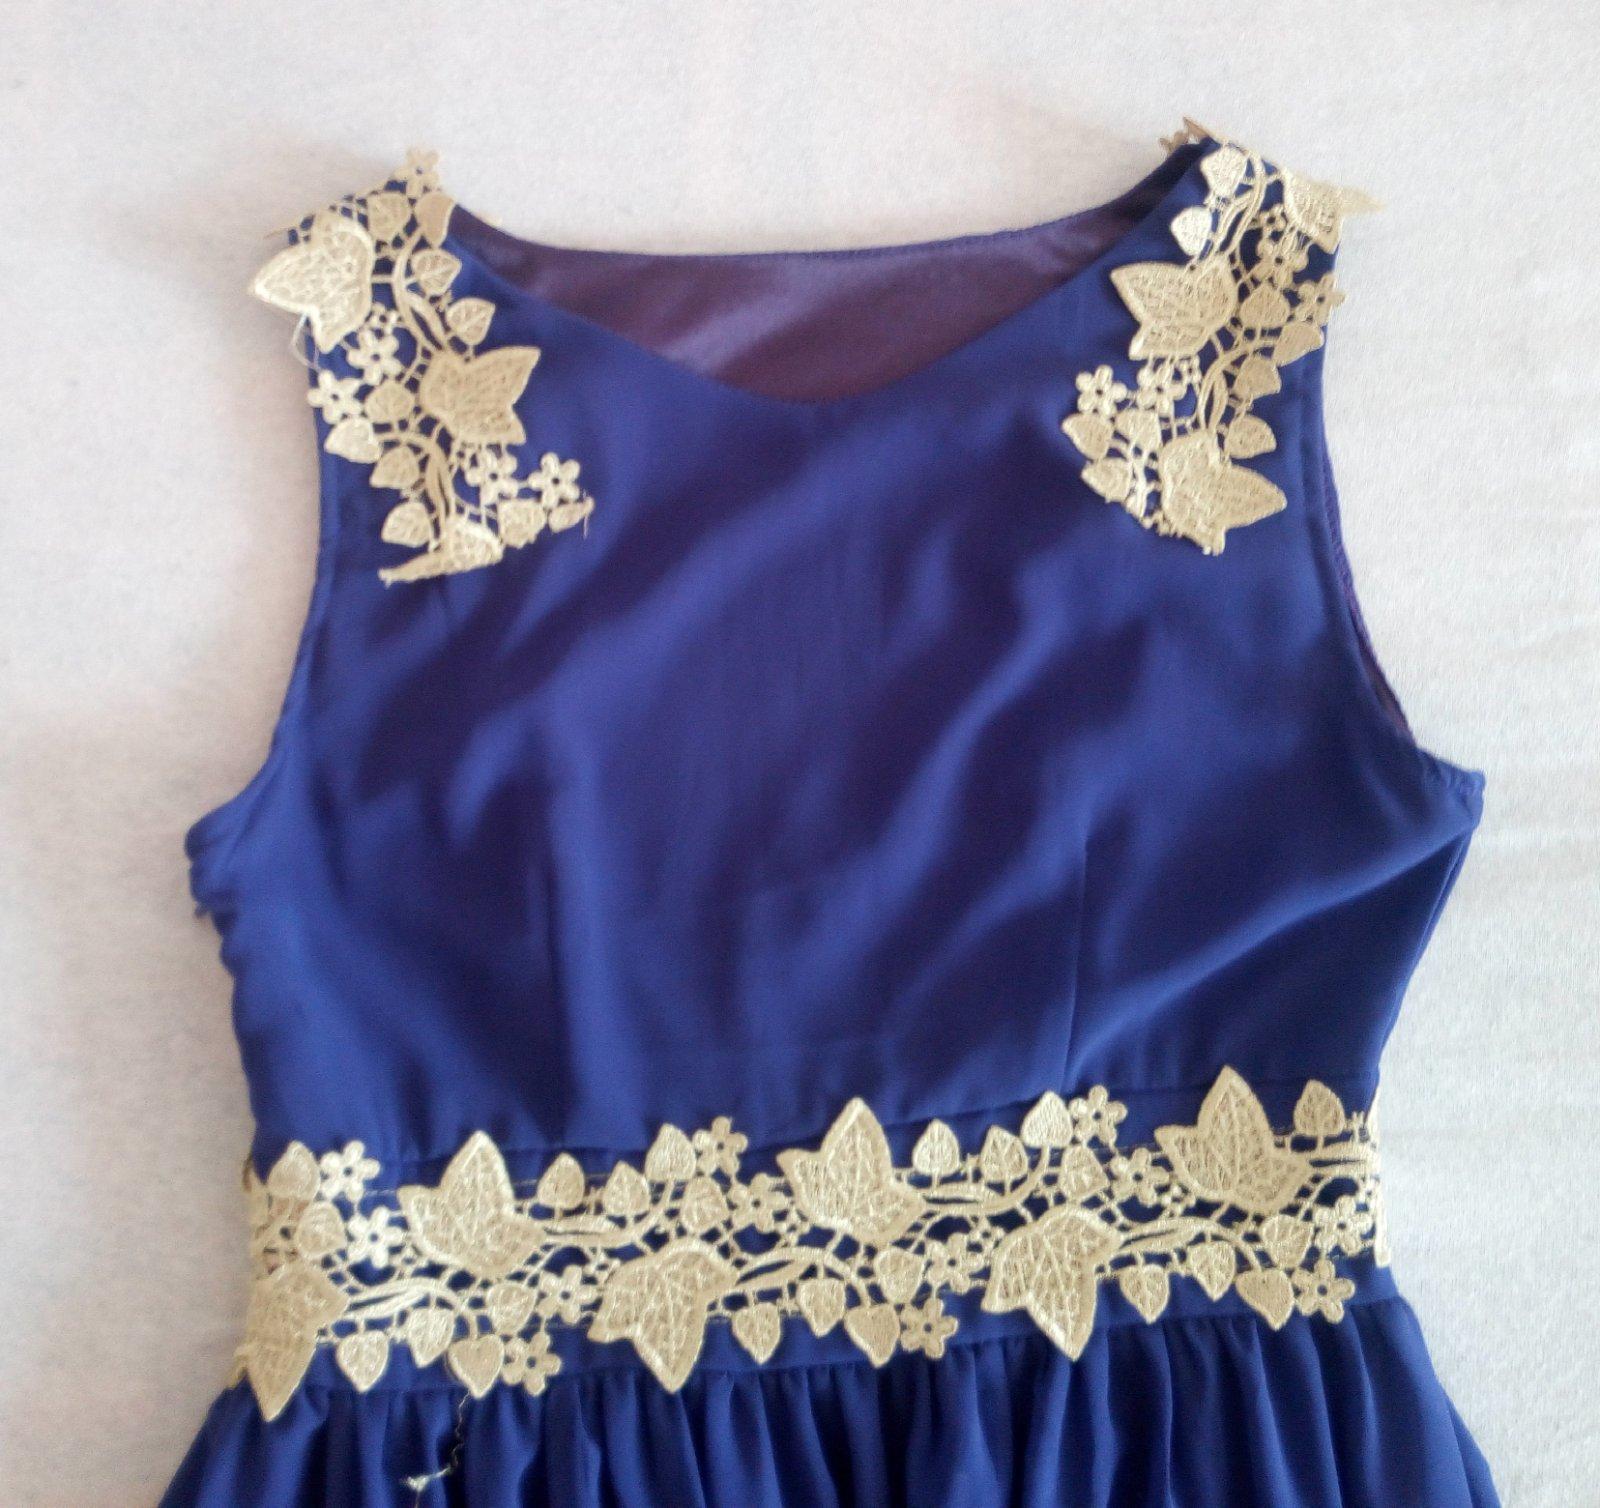 Dlhé fialové spoločenské šaty - Obrázok č. 2